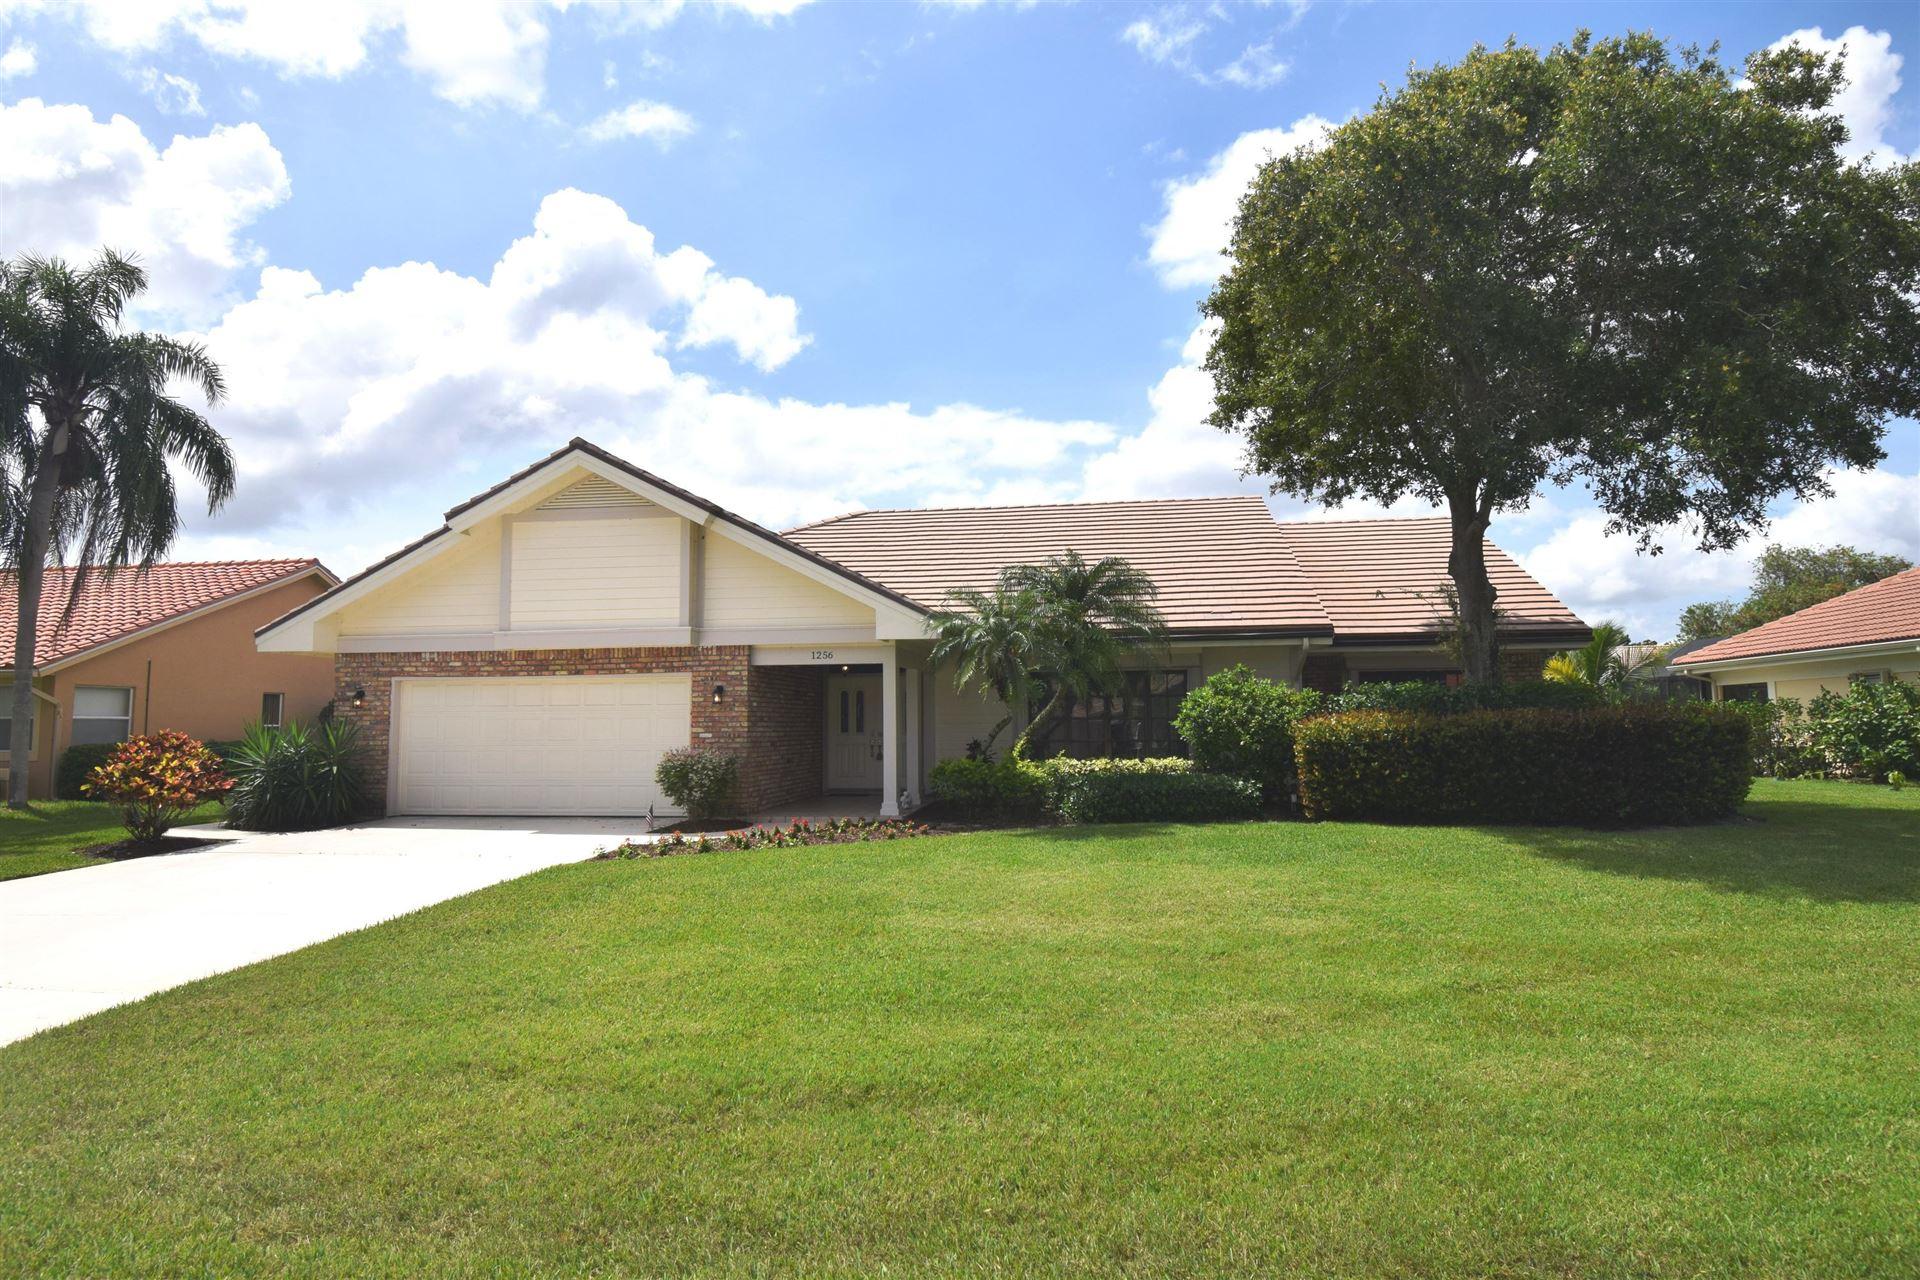 1256 SW Starlite Cove, Port Saint Lucie, FL 34986 - #: RX-10626939